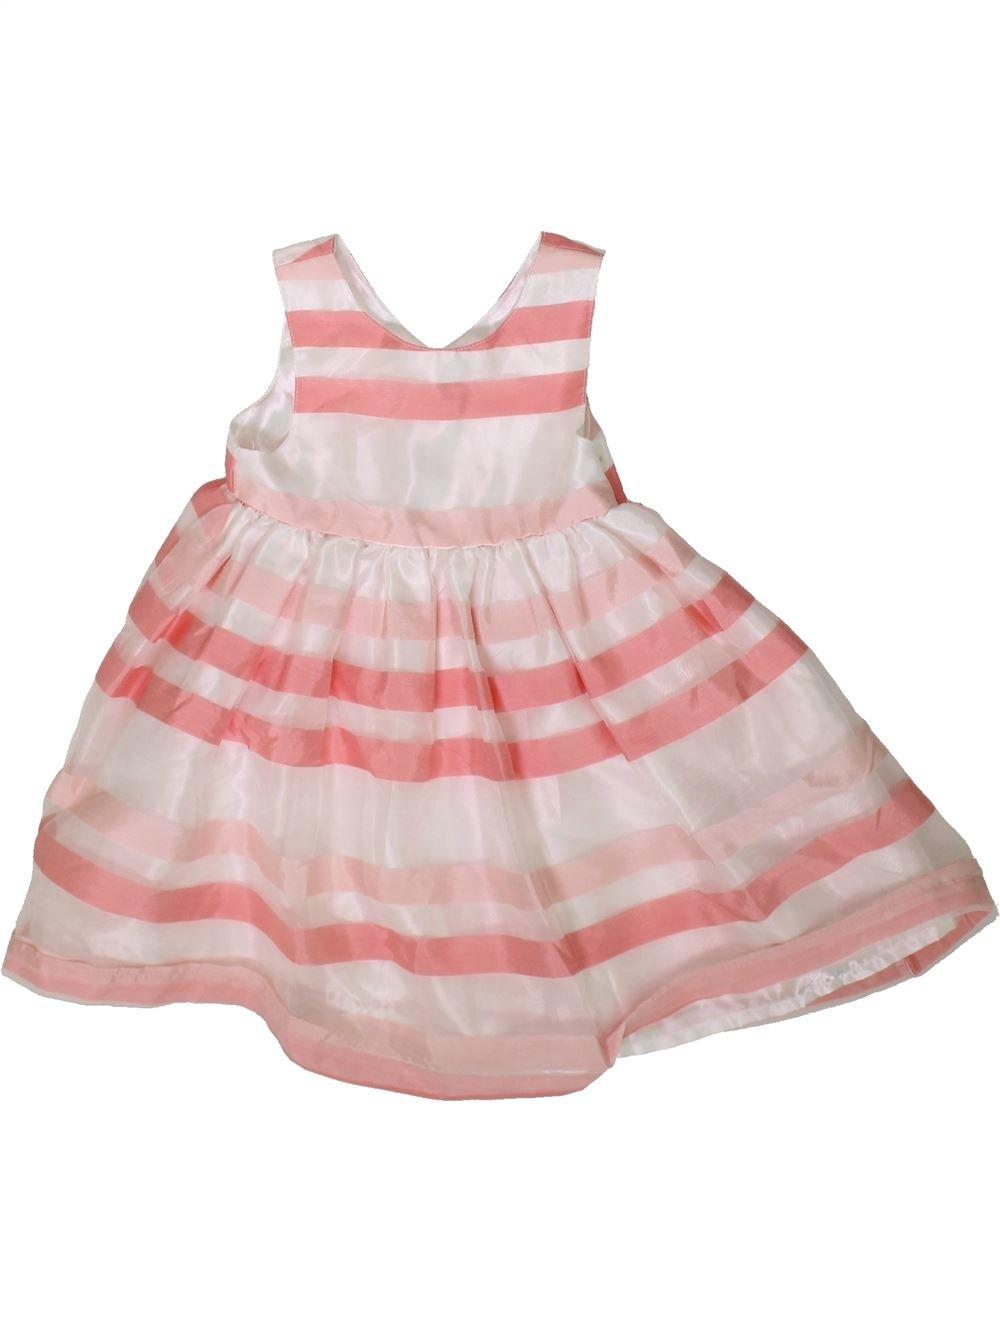 f63ccaa8f66 Robe rose KIABI du 2 ans pour Fille - 1367361